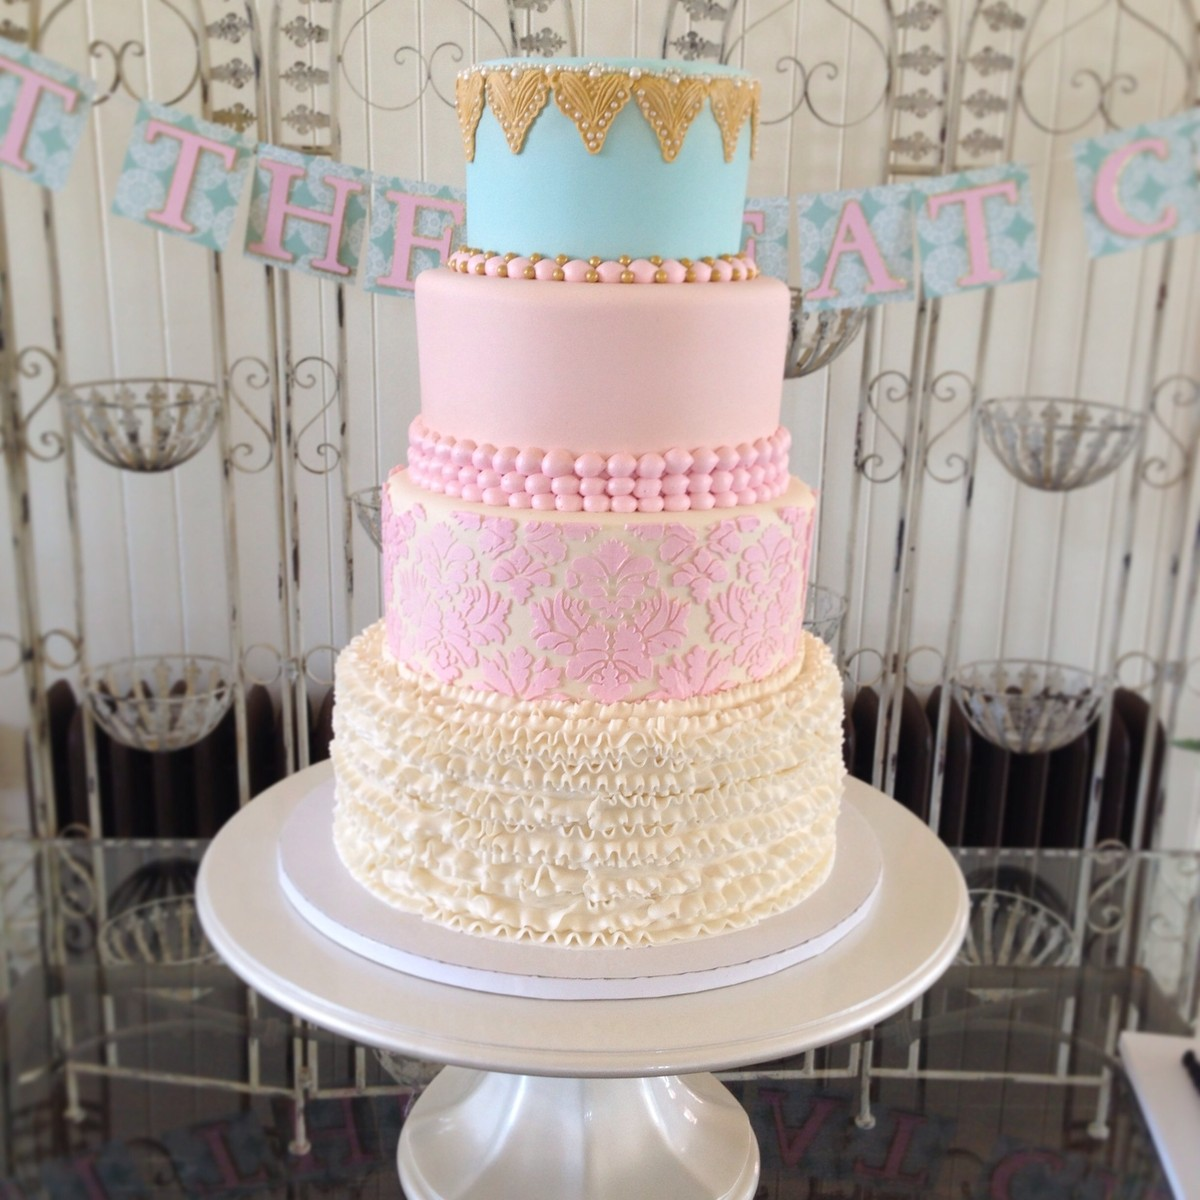 Oklahoma City Wedding Cakes - Reviews for 15 Cakes